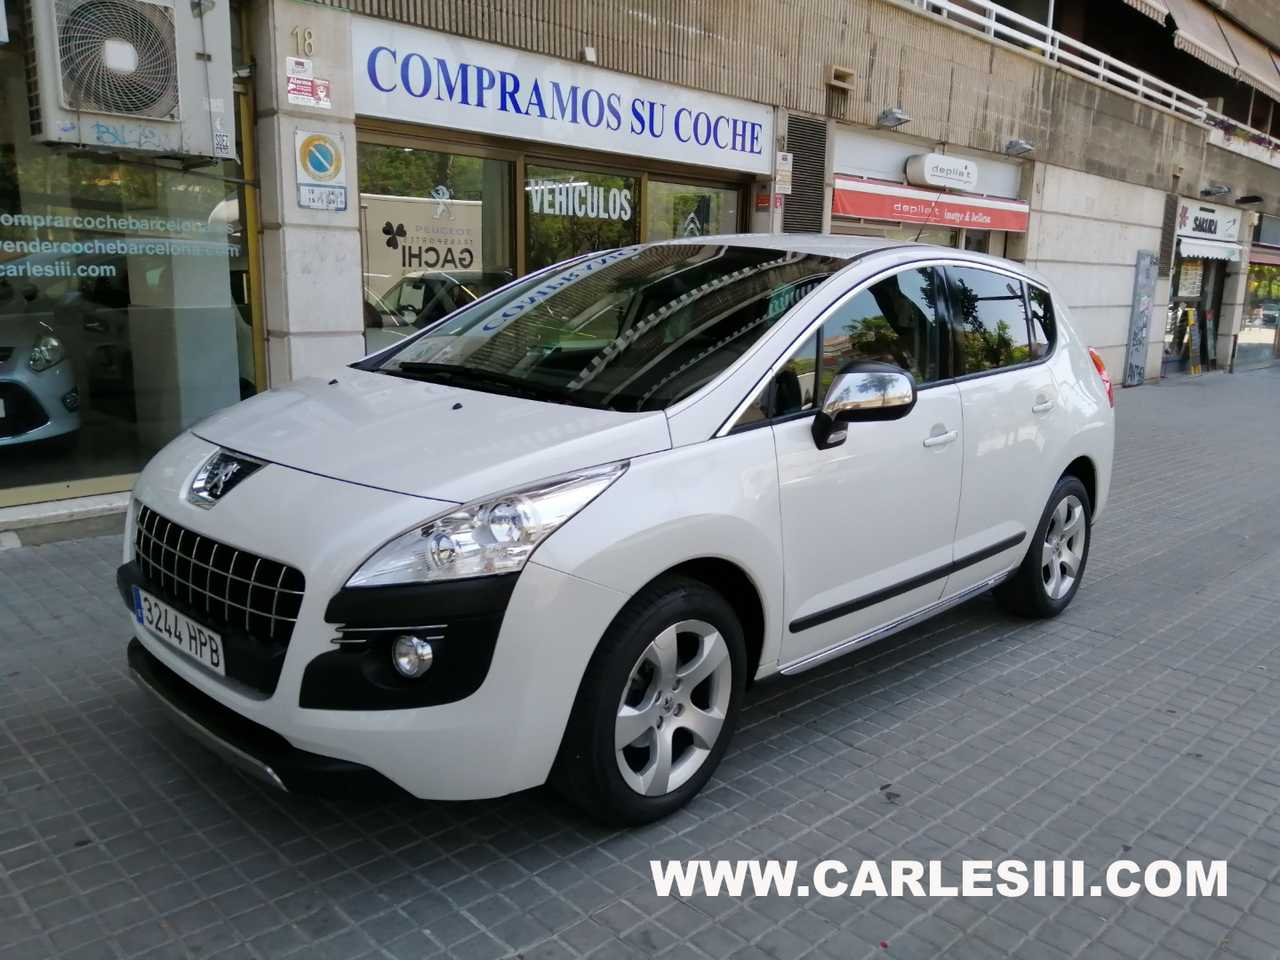 Peugeot 3008 1.6 HDI 115 FAP   - Foto 1